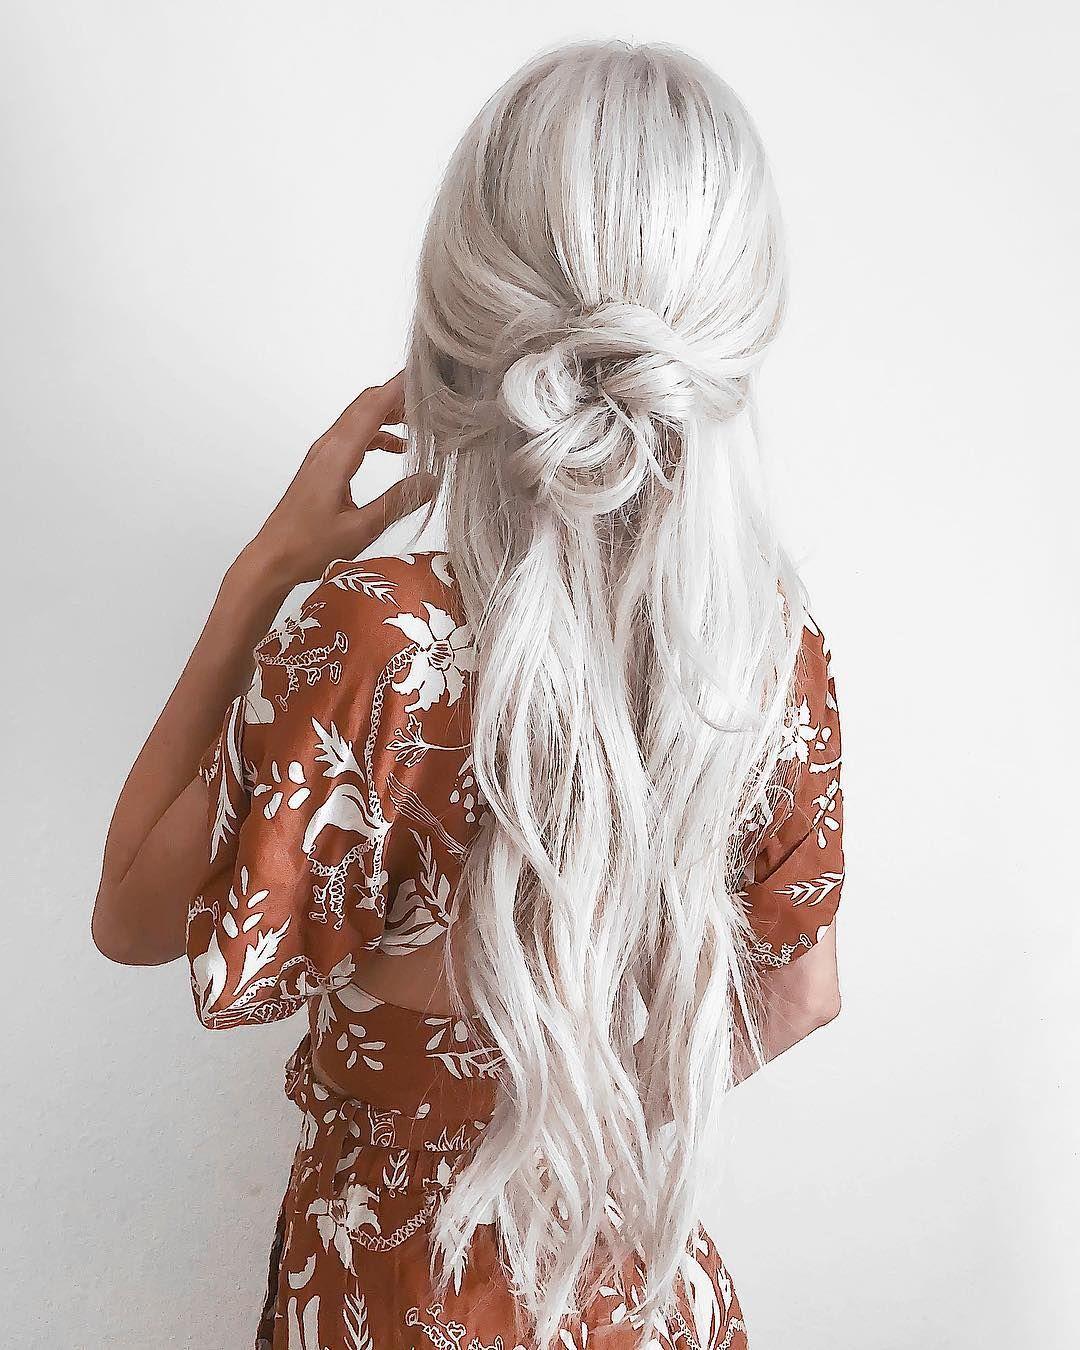 Hair Inspiration 2019-04-19 05:12:03